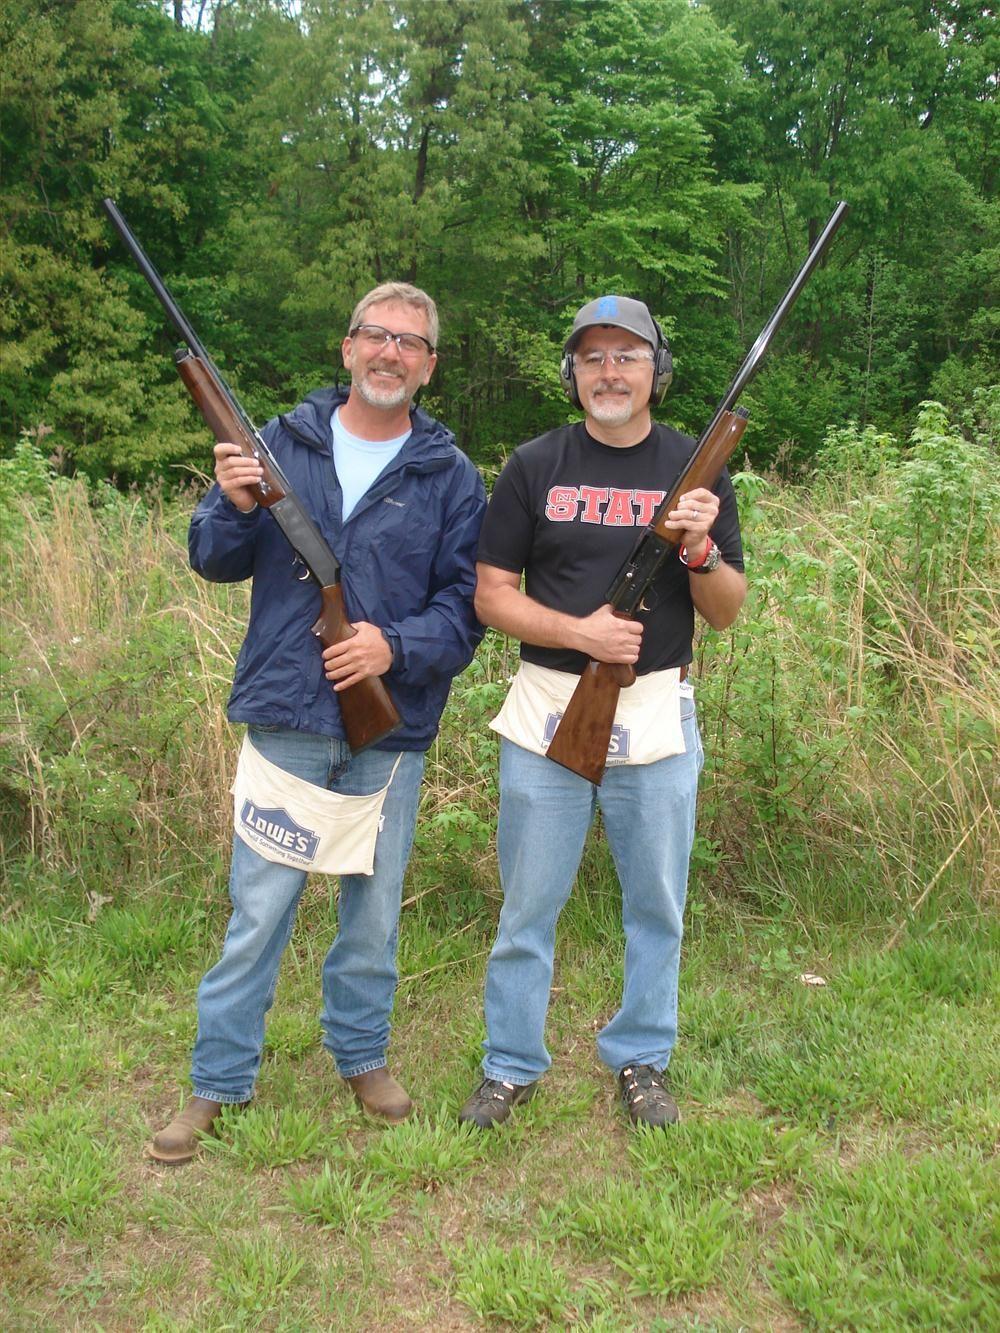 Marty (L) and Jeff Greene, both of KRG Utility in Lenoir, N.C., use Browning 12 gauge shotguns.